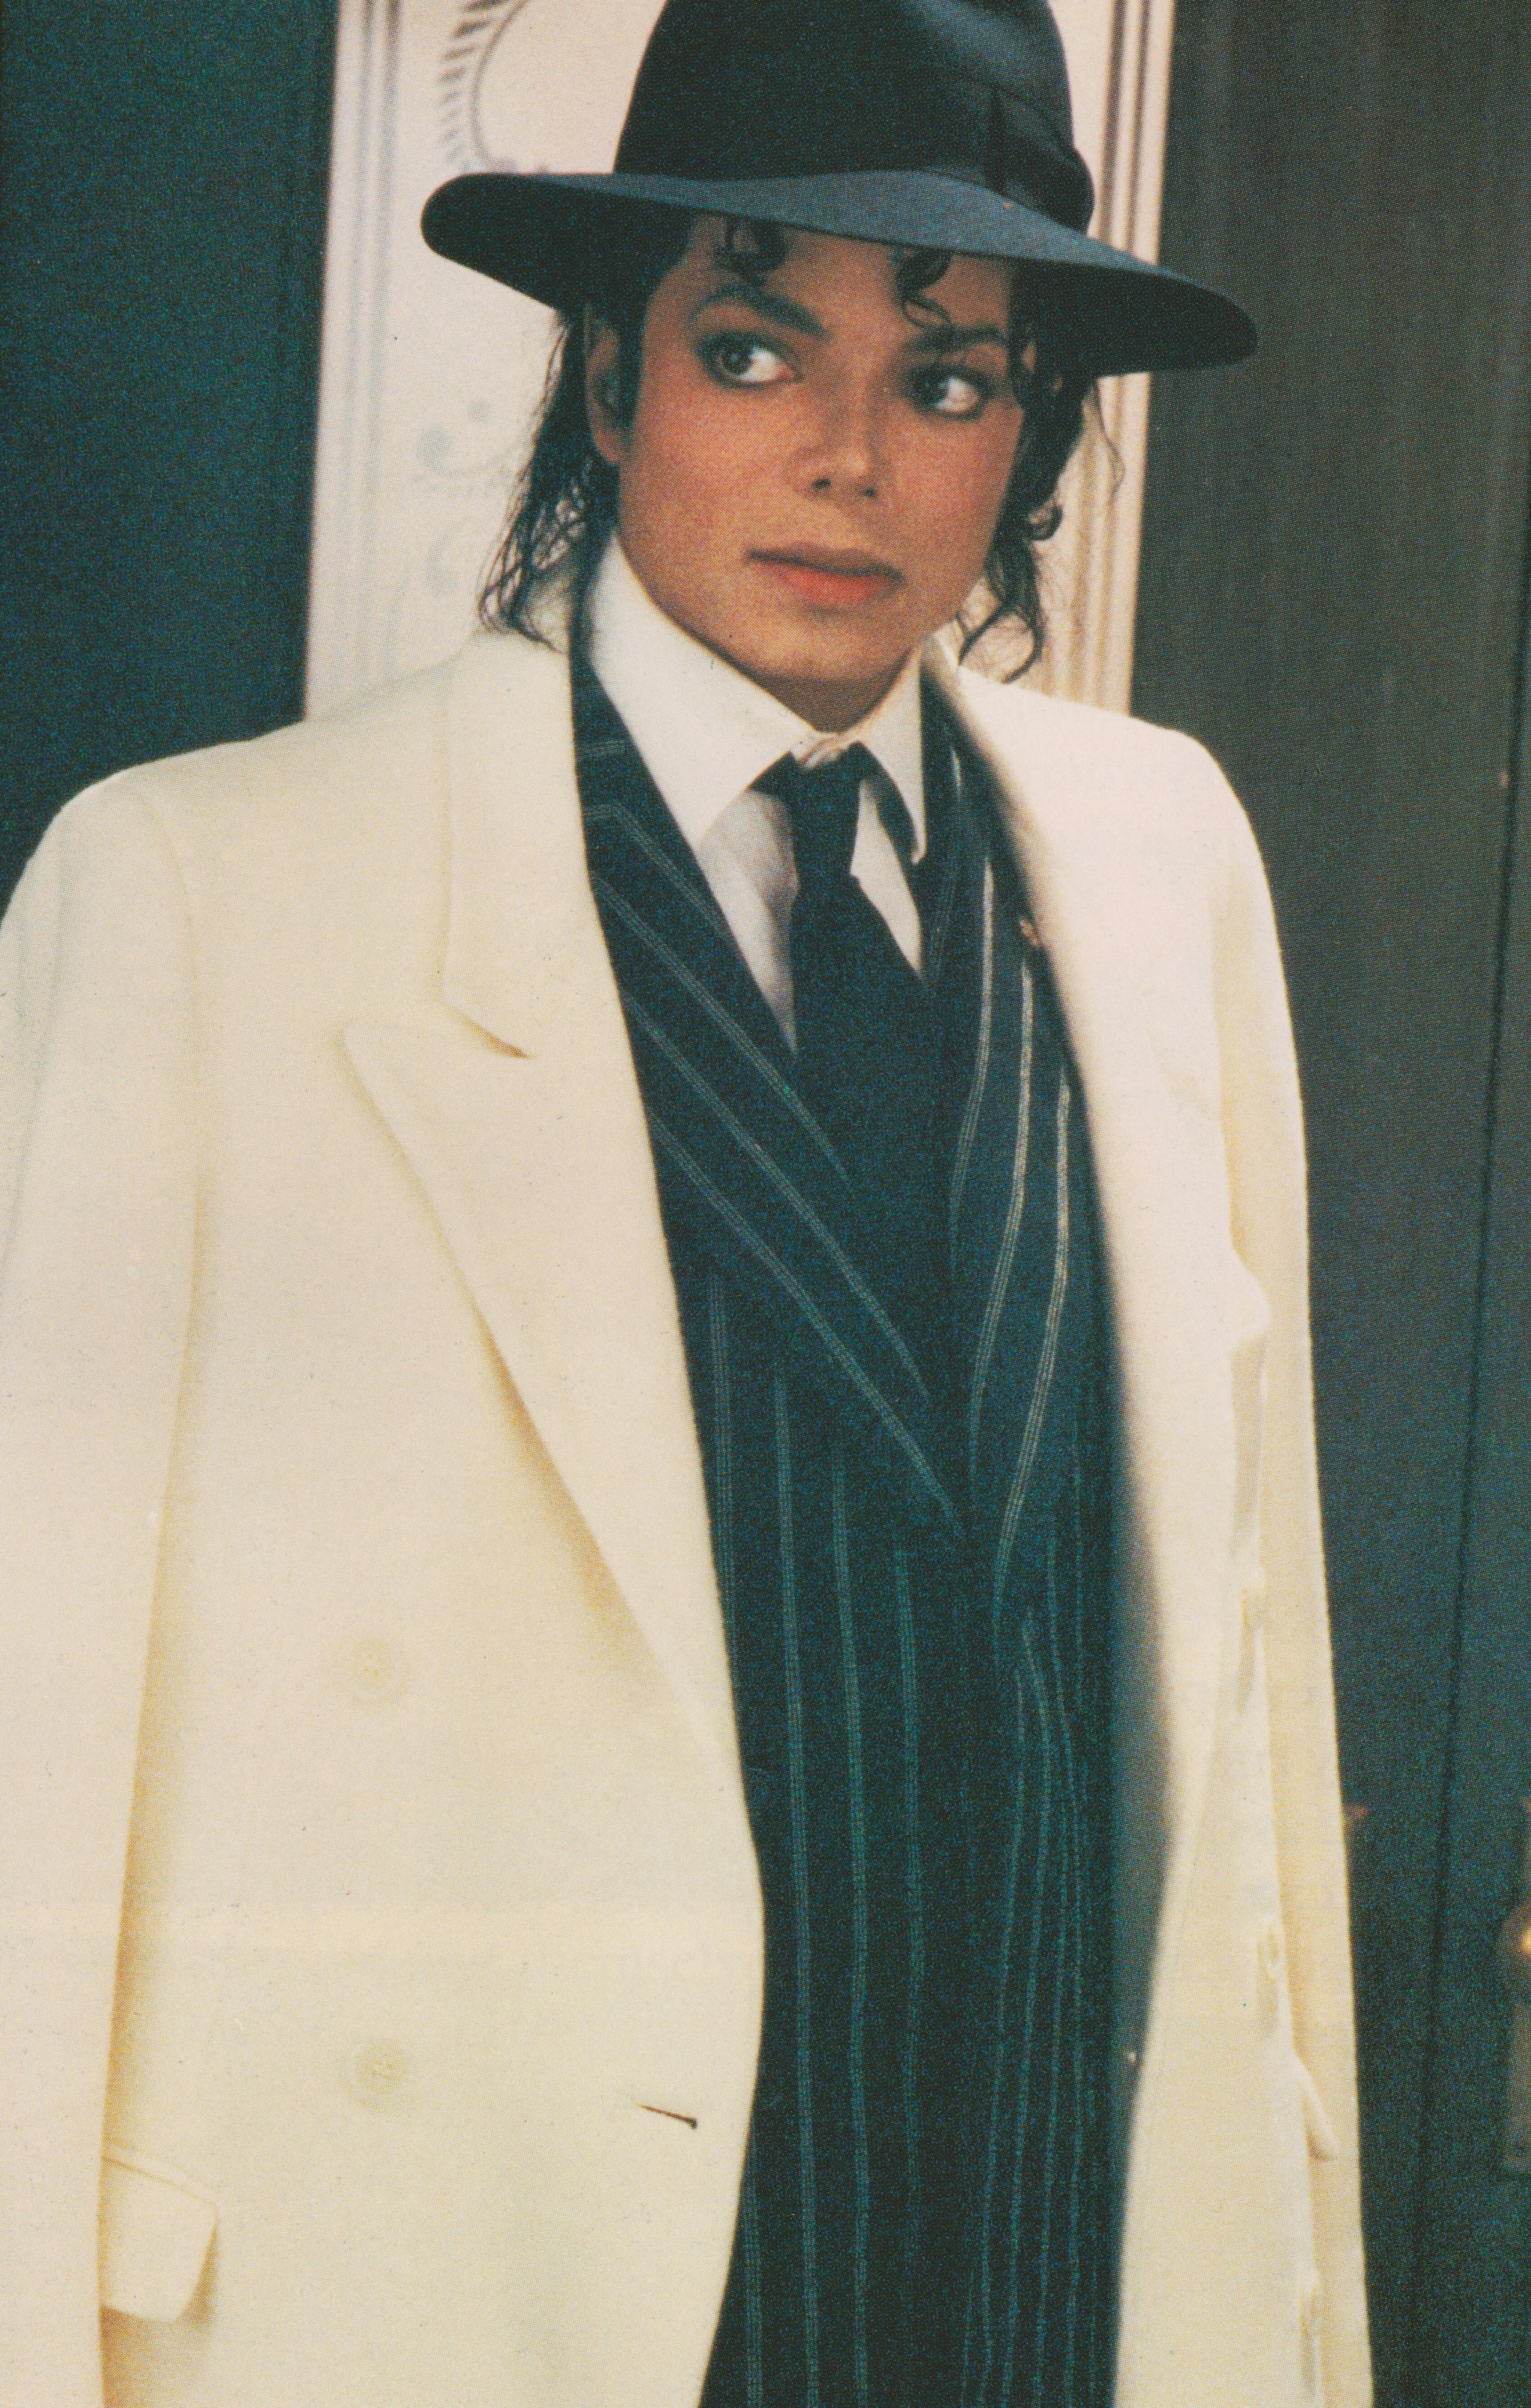 Michael Jackson - HQ Scan - Moonwalker